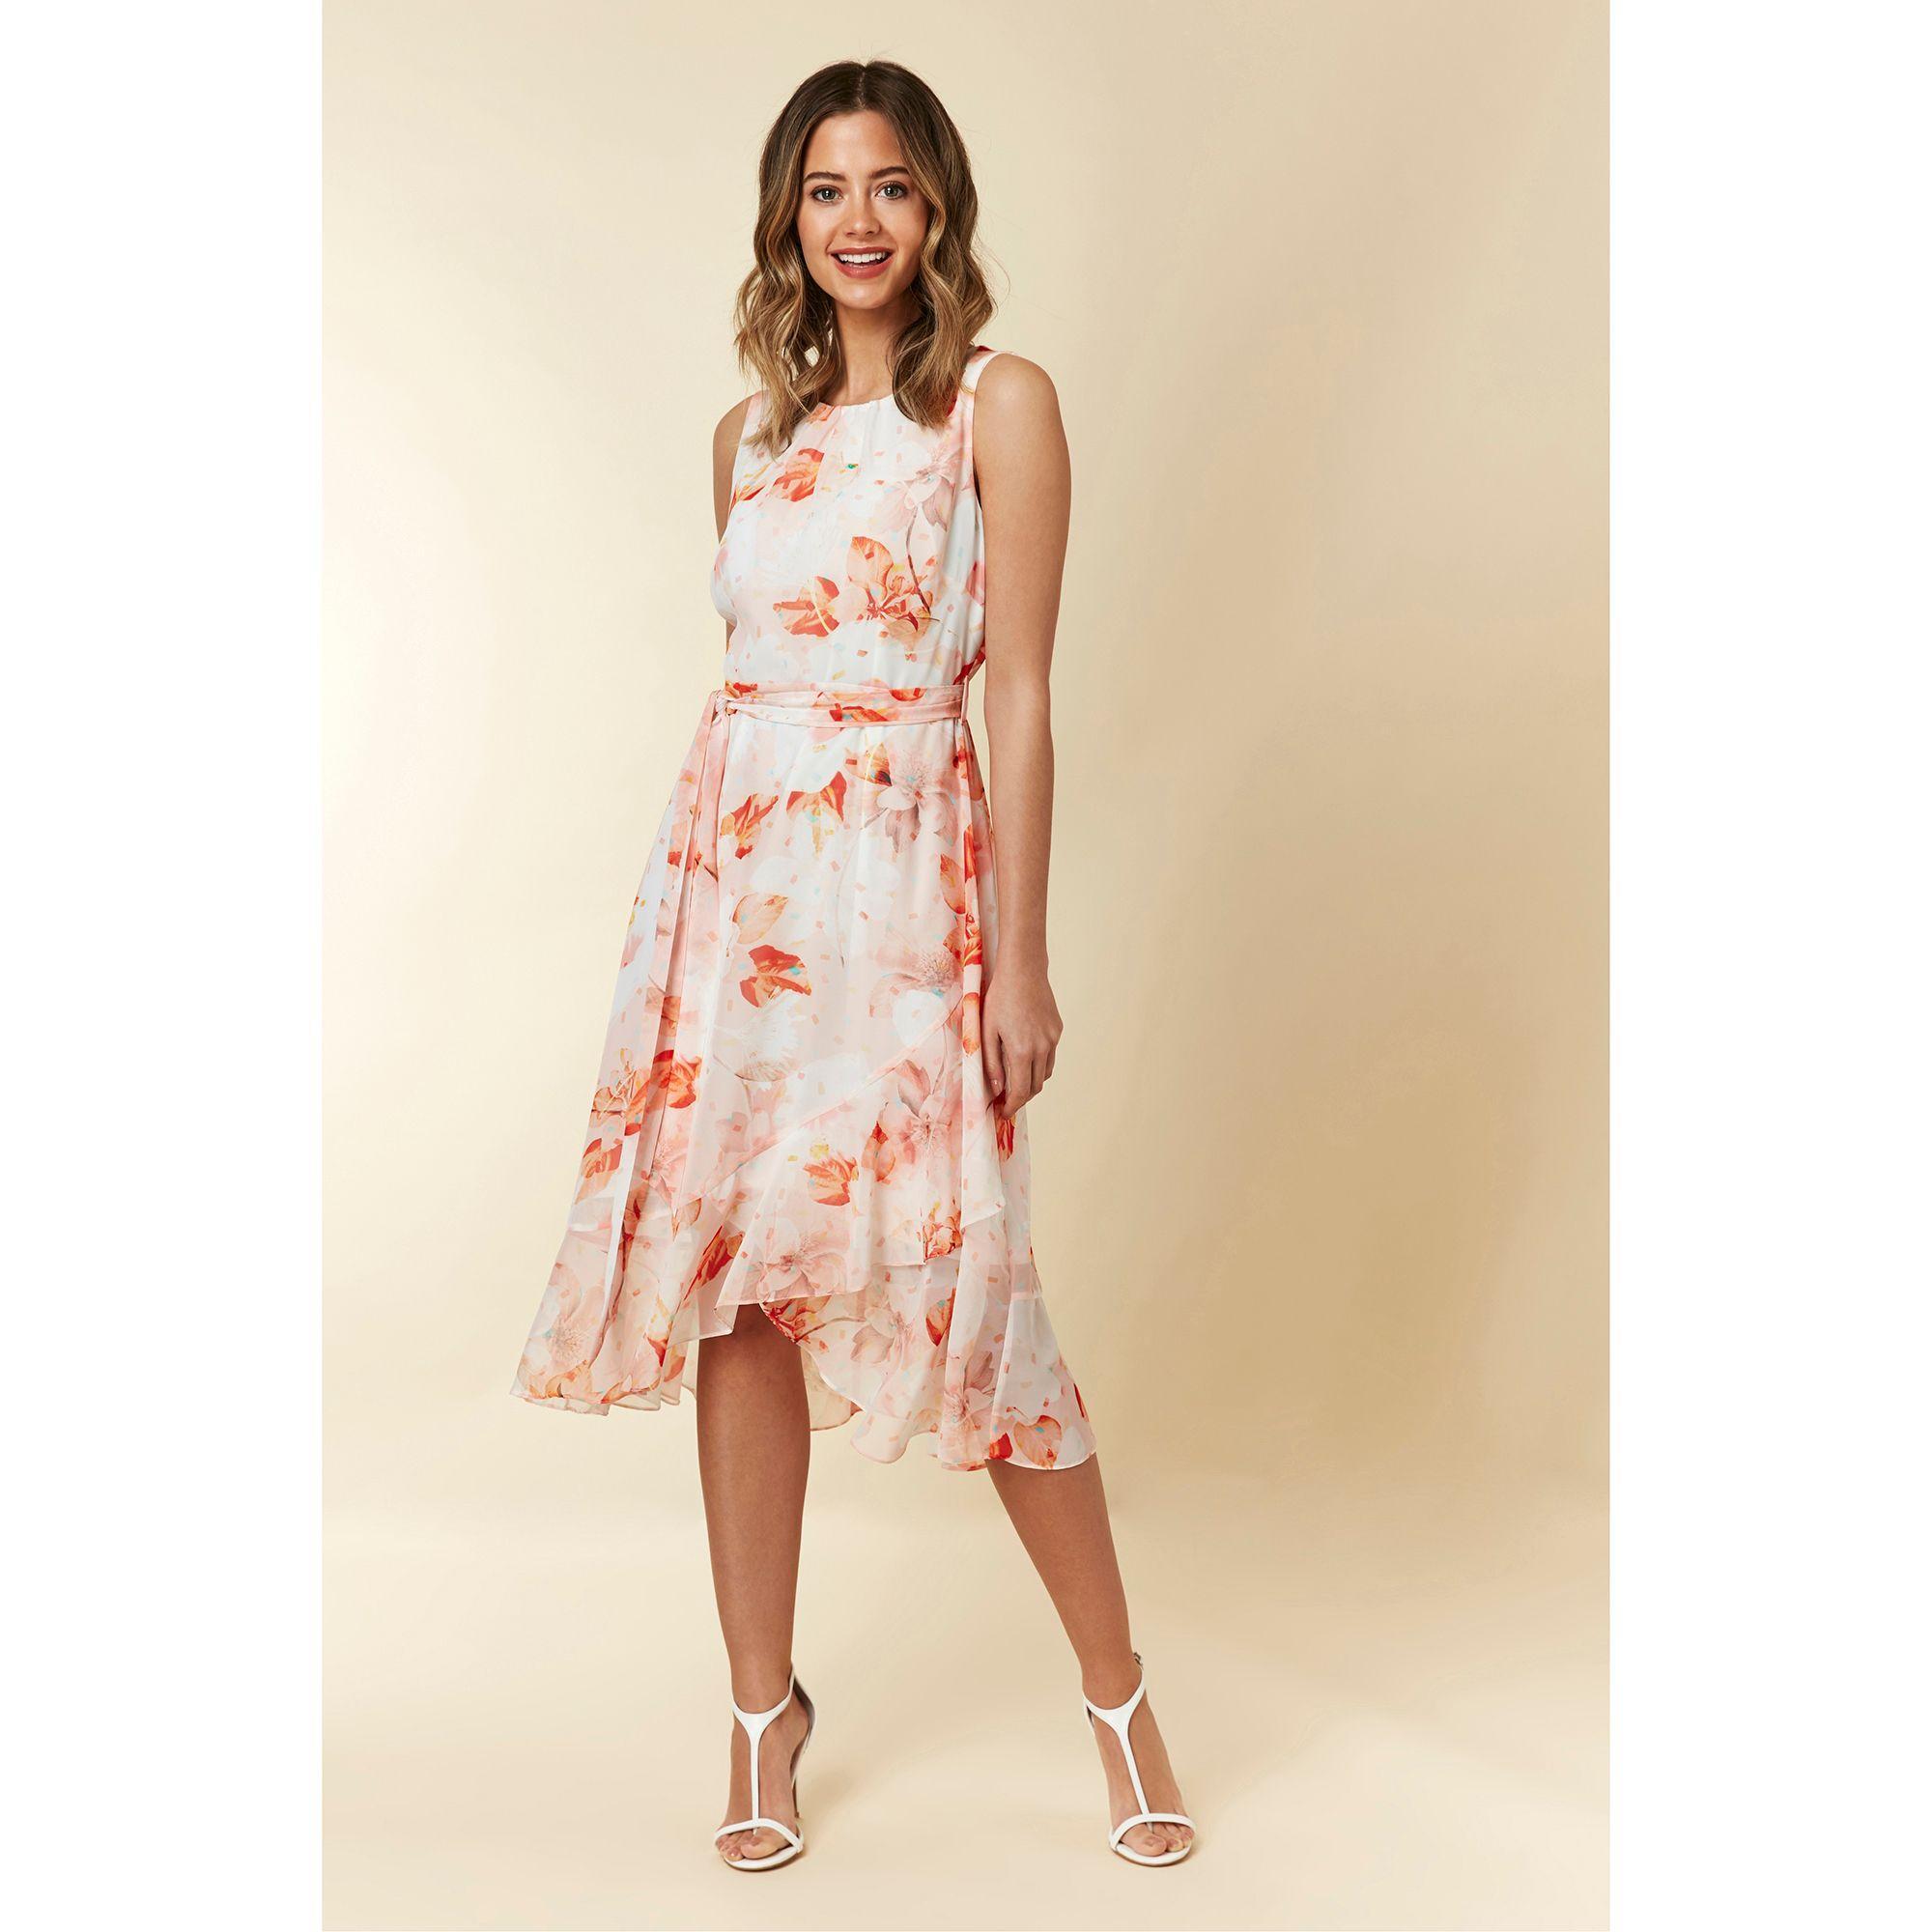 2d238c06e75d5 Wallis Petite Navy Floral Print Maxi Dress - Aztec Stone and ...